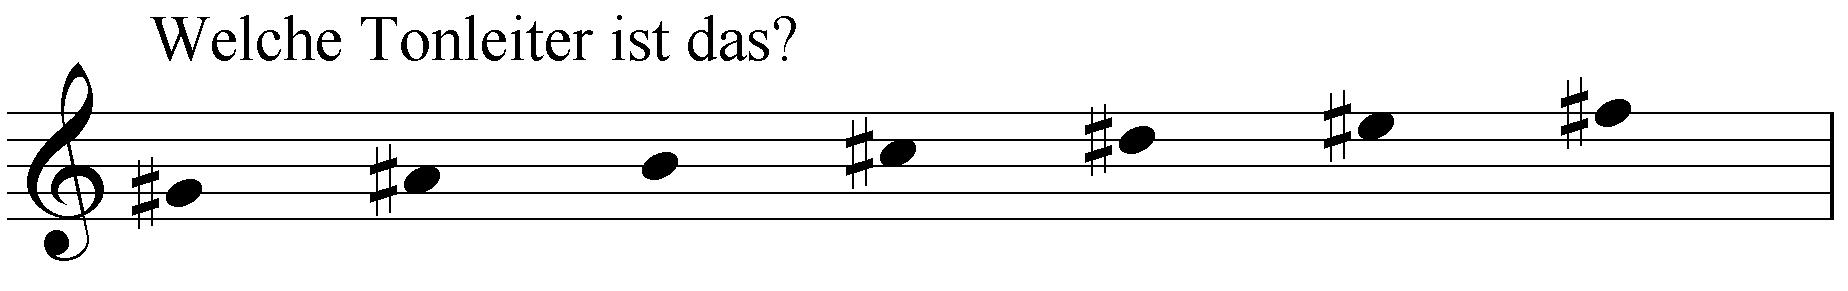 Welche Tonleiter ist das: gis ais h cis dis eis fis?